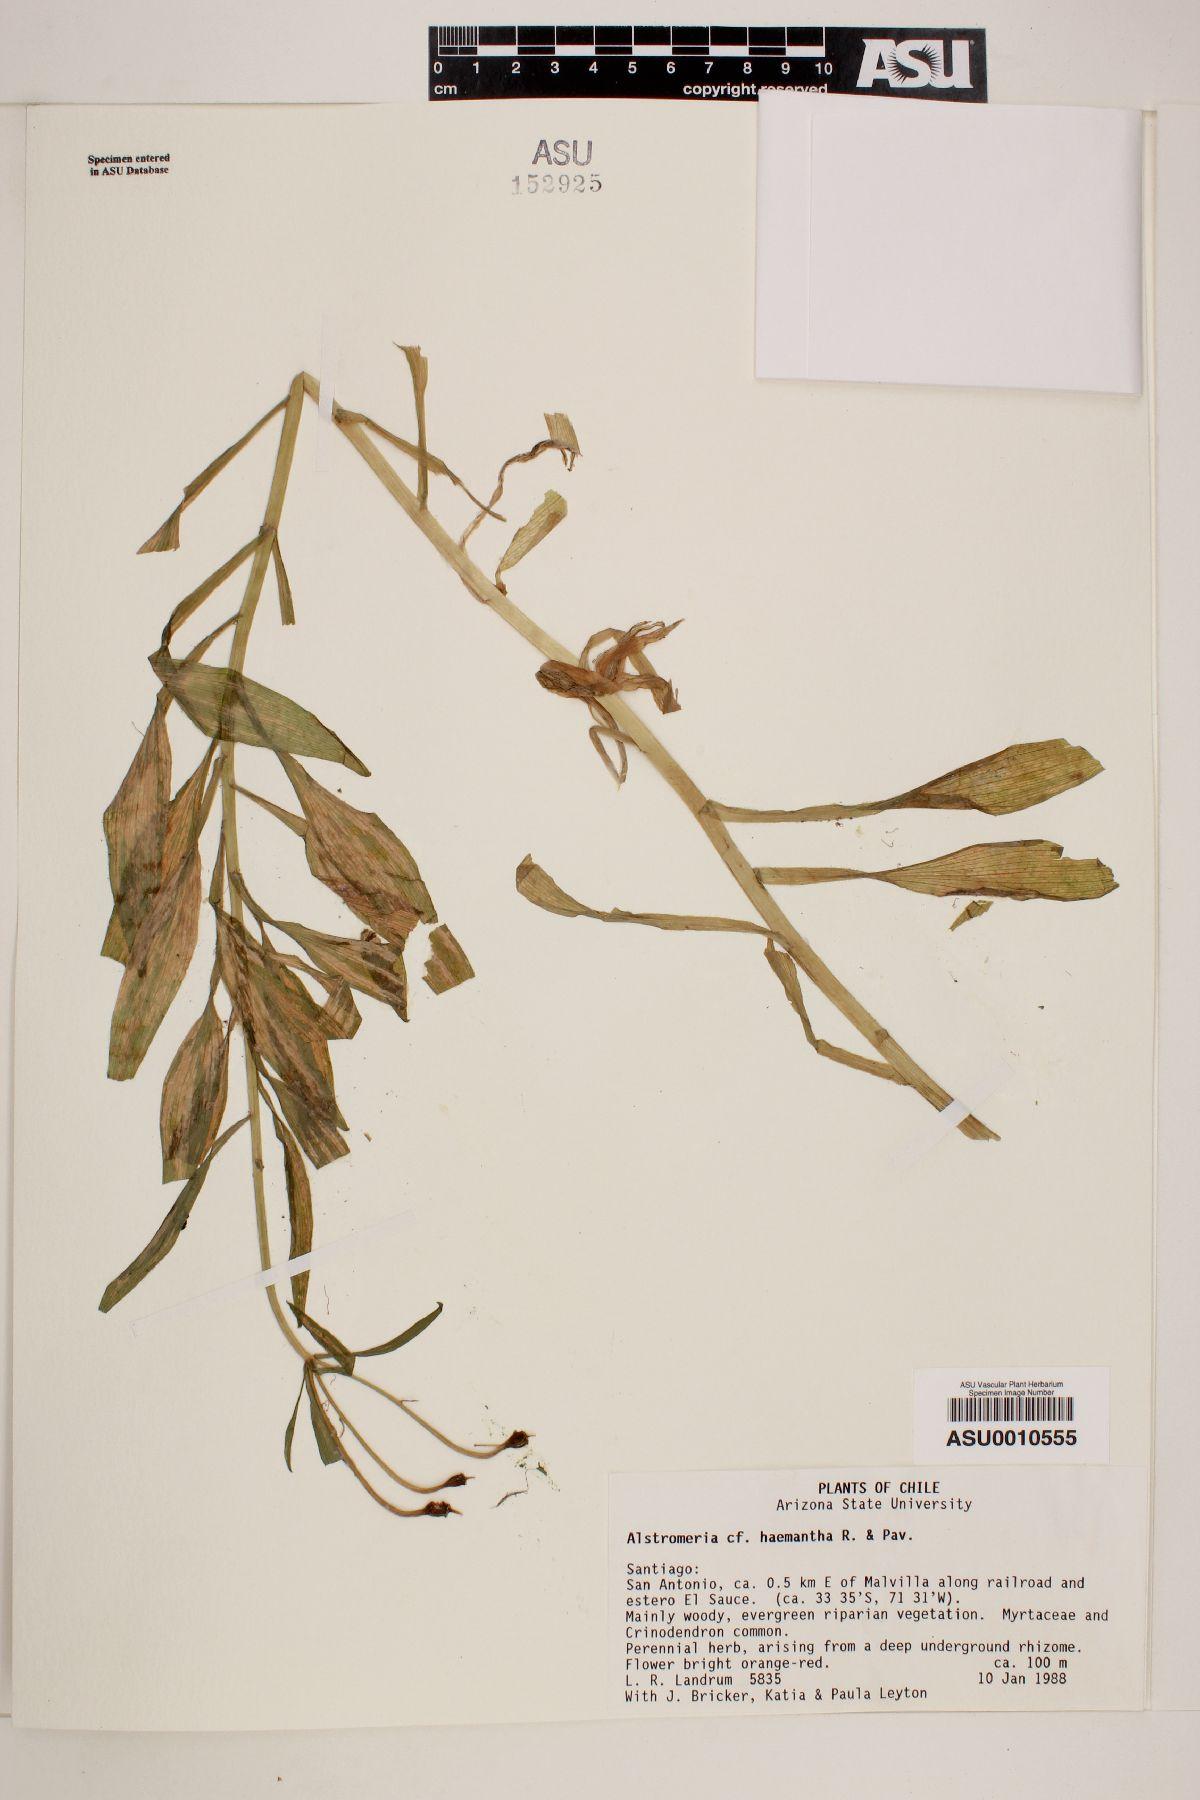 Alstroemeria haemantha image